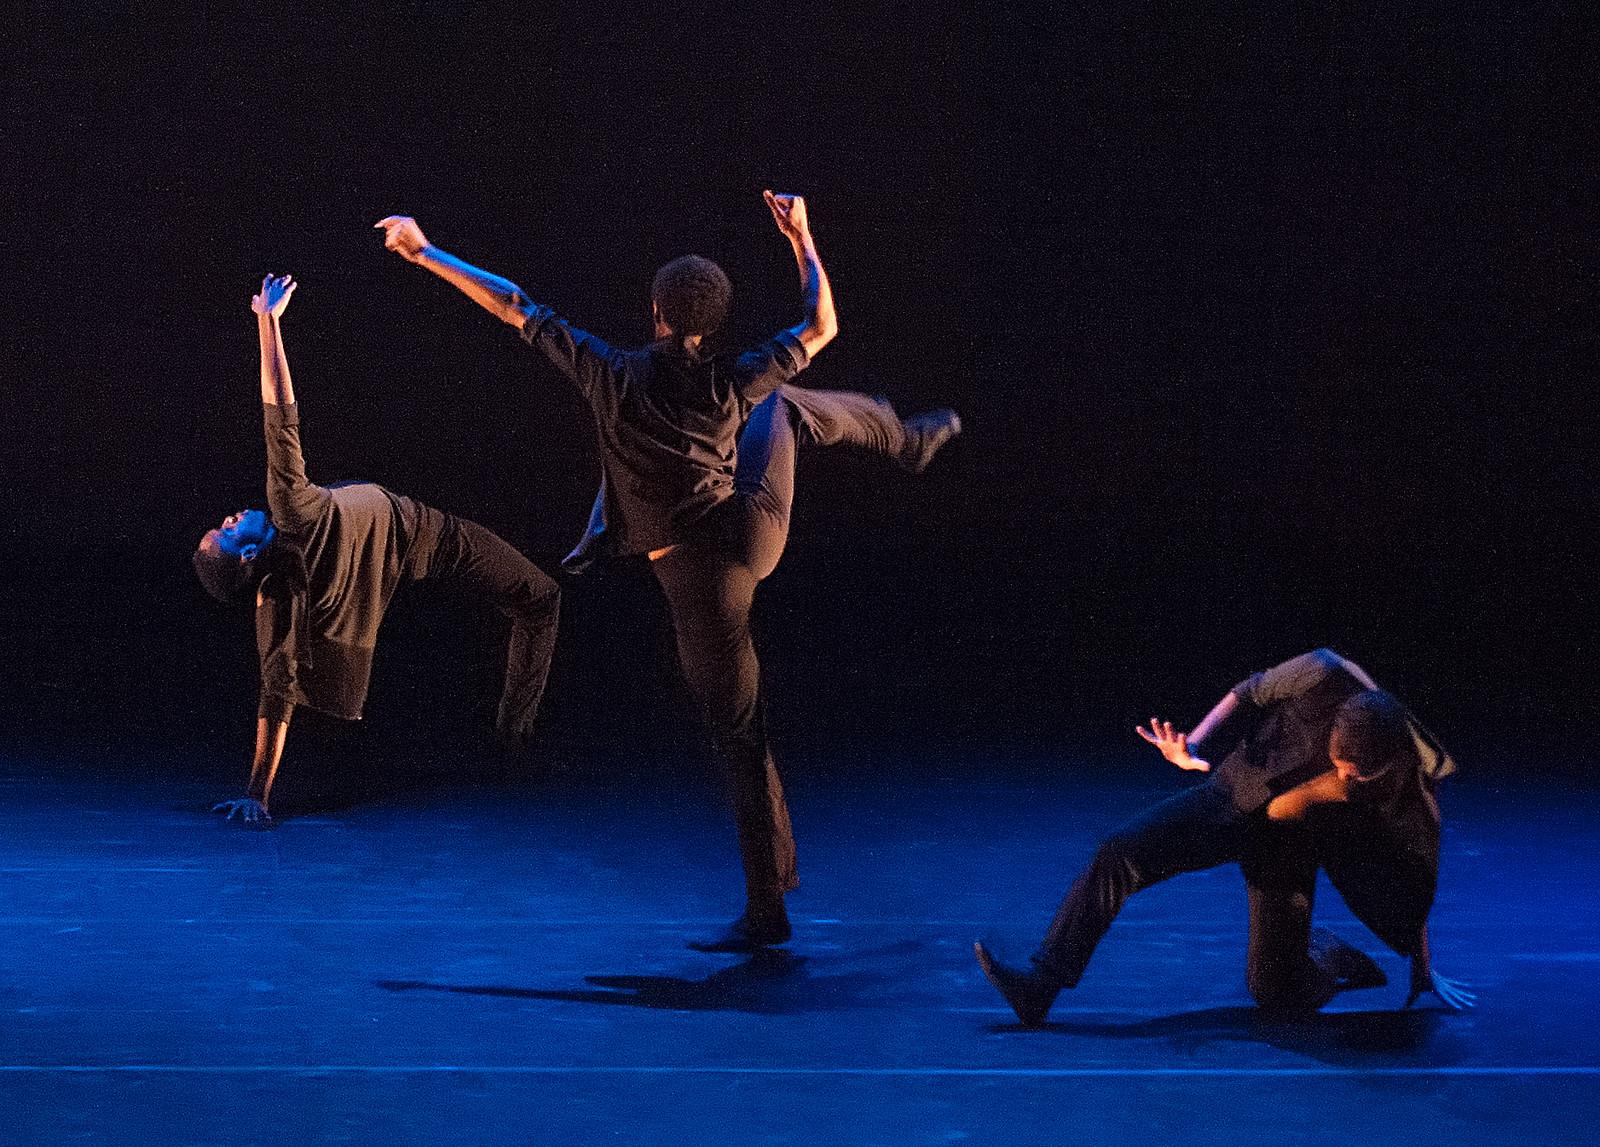 LaGuardia Graduation Dance Friday Performance 2014 Folder 2-607-X3.jpg